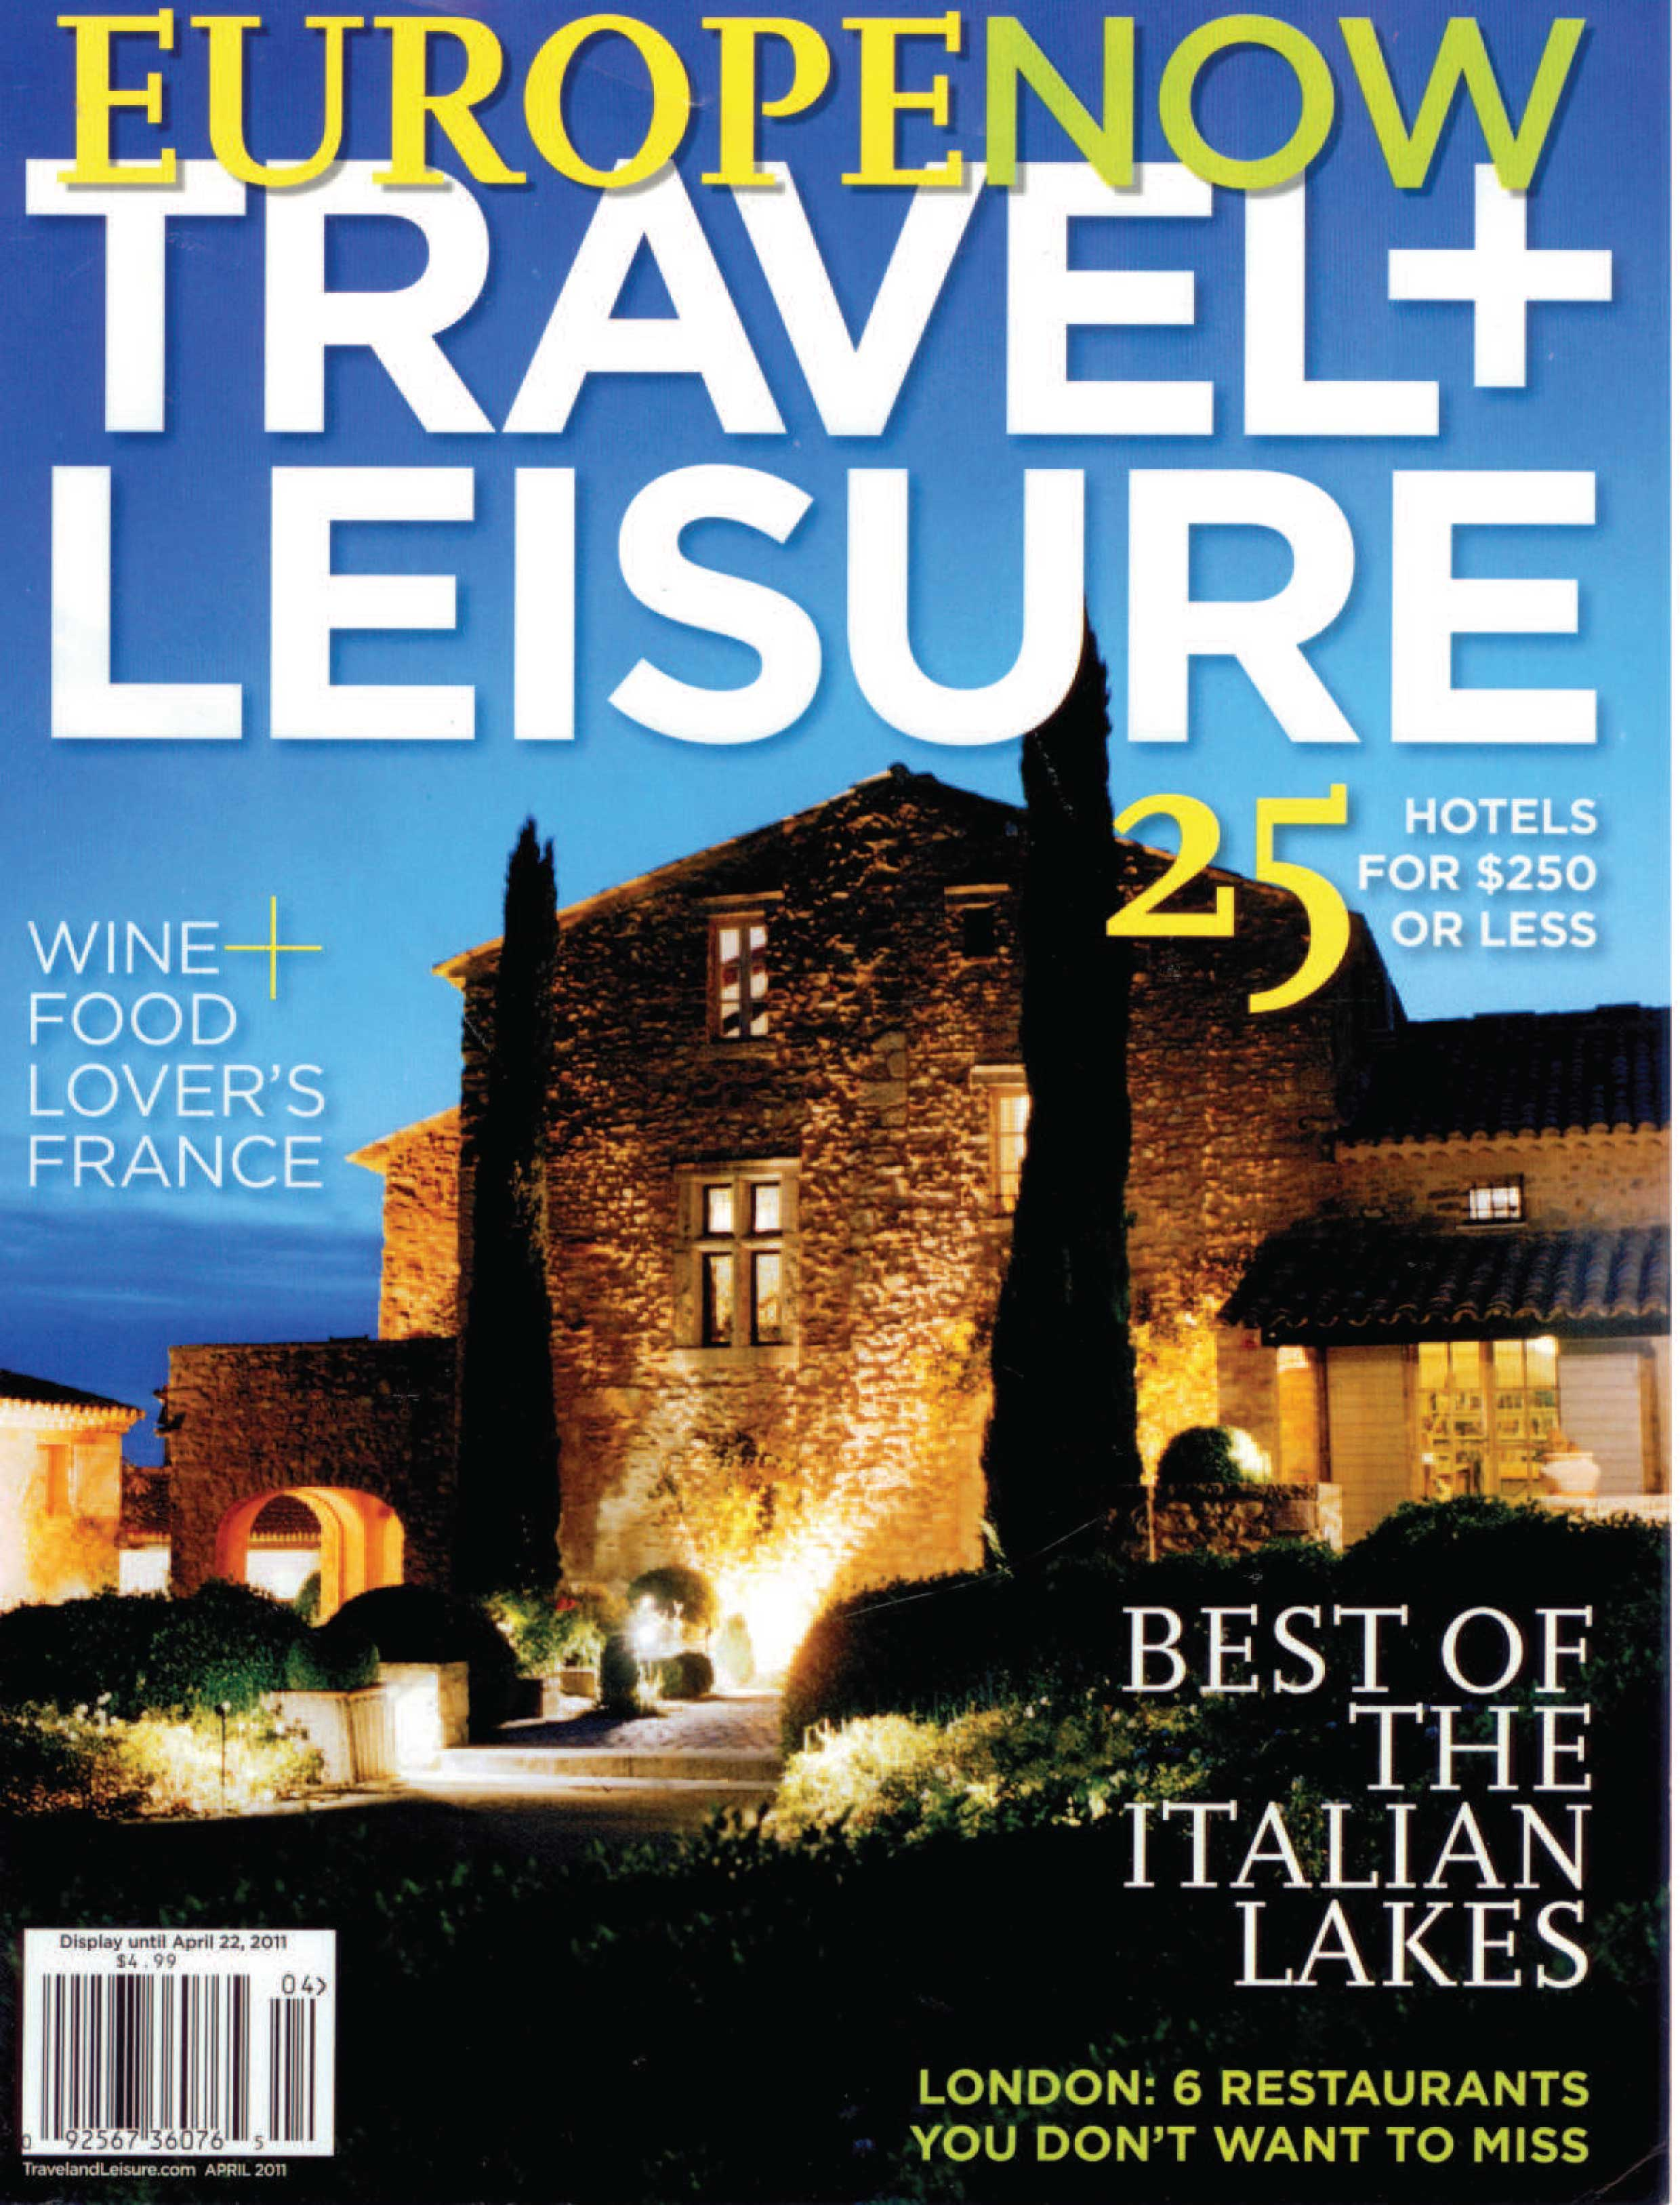 La Verriere Travel + Leisure